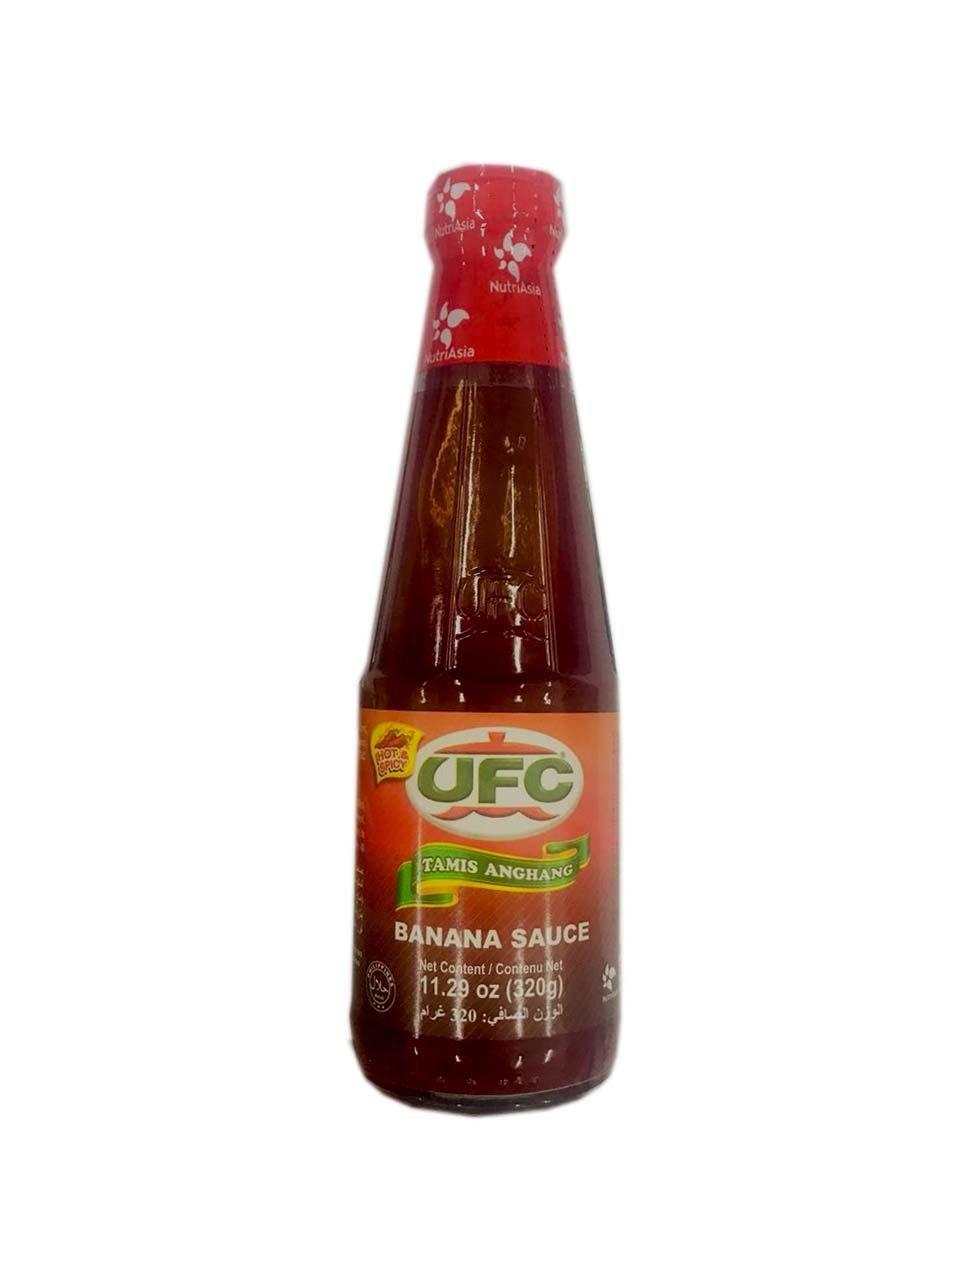 UFC Banana Sauce Tamis(hot & spicy) Anghang 320g